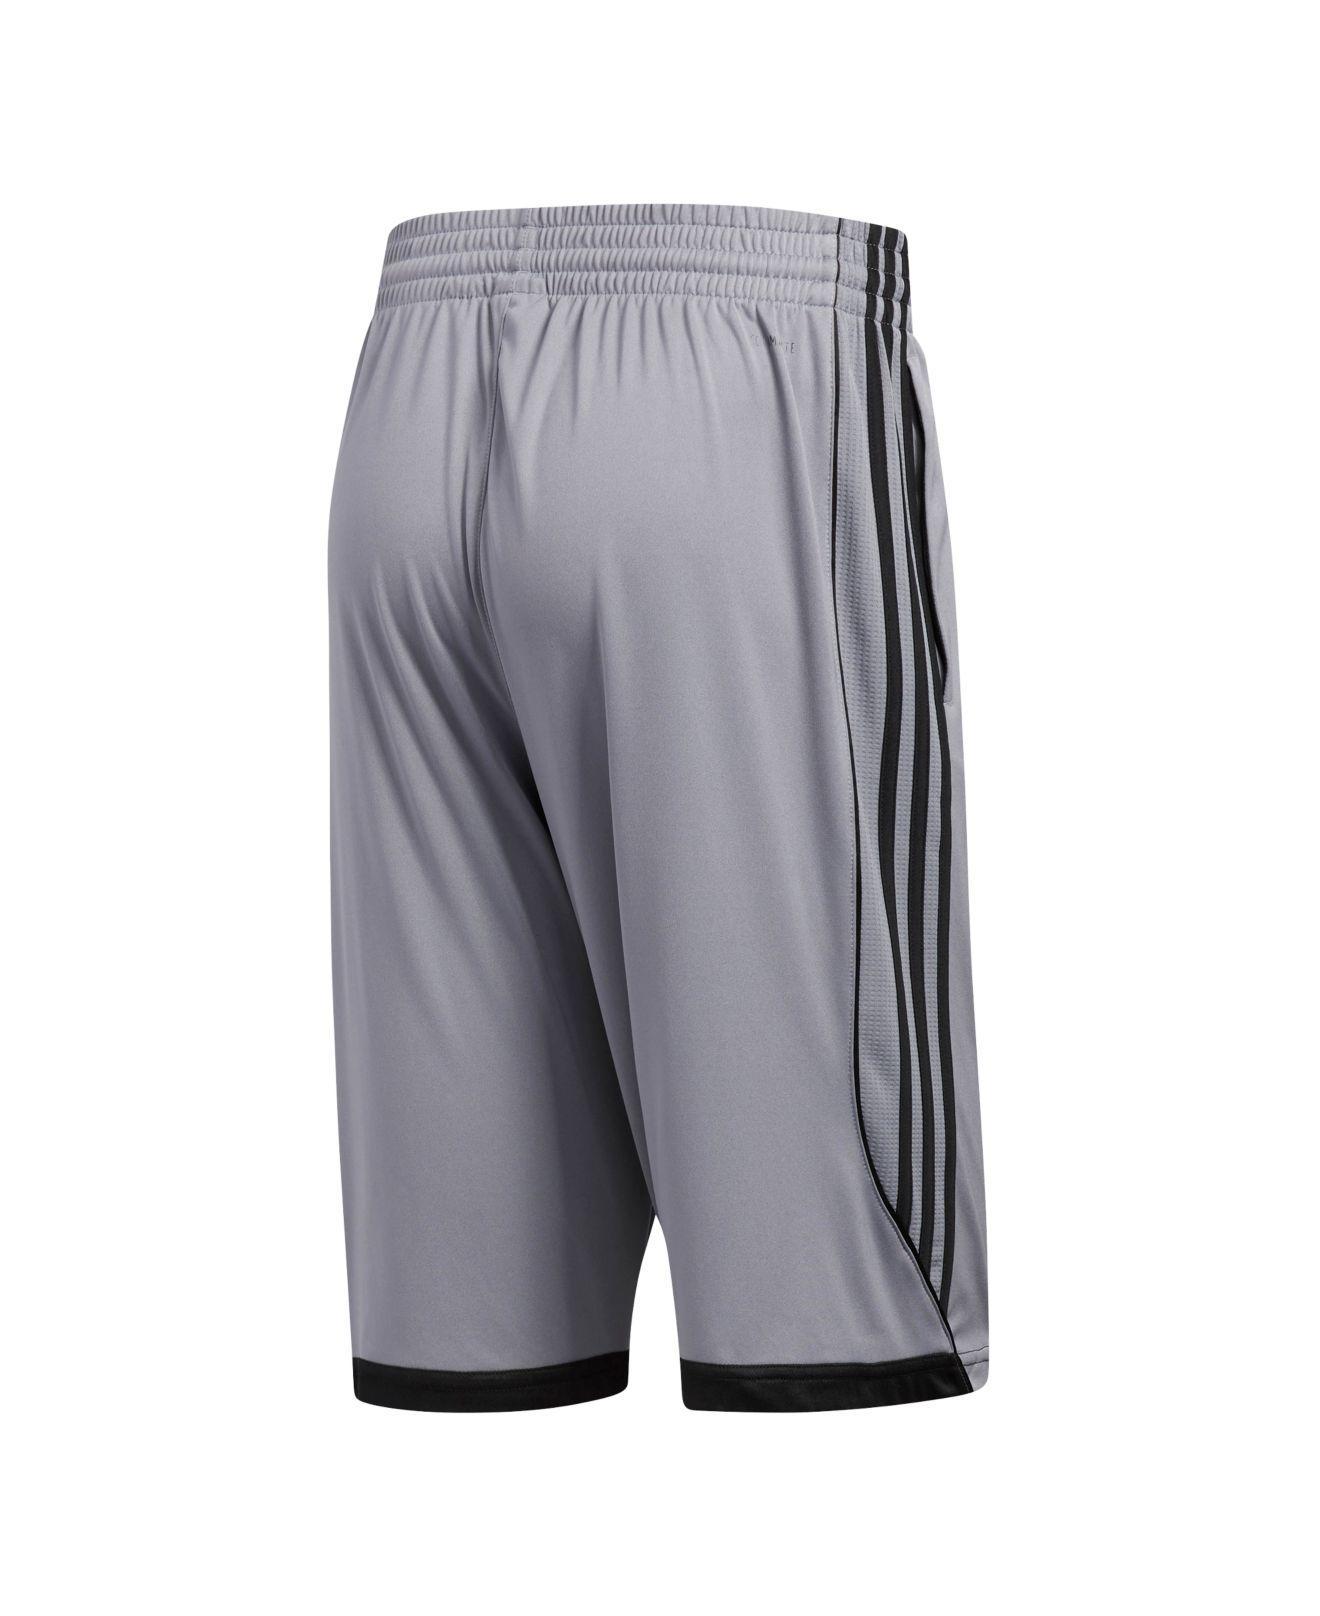 ADIDAS MEN'S CLIMATE Panel Athletic Shorts Black White